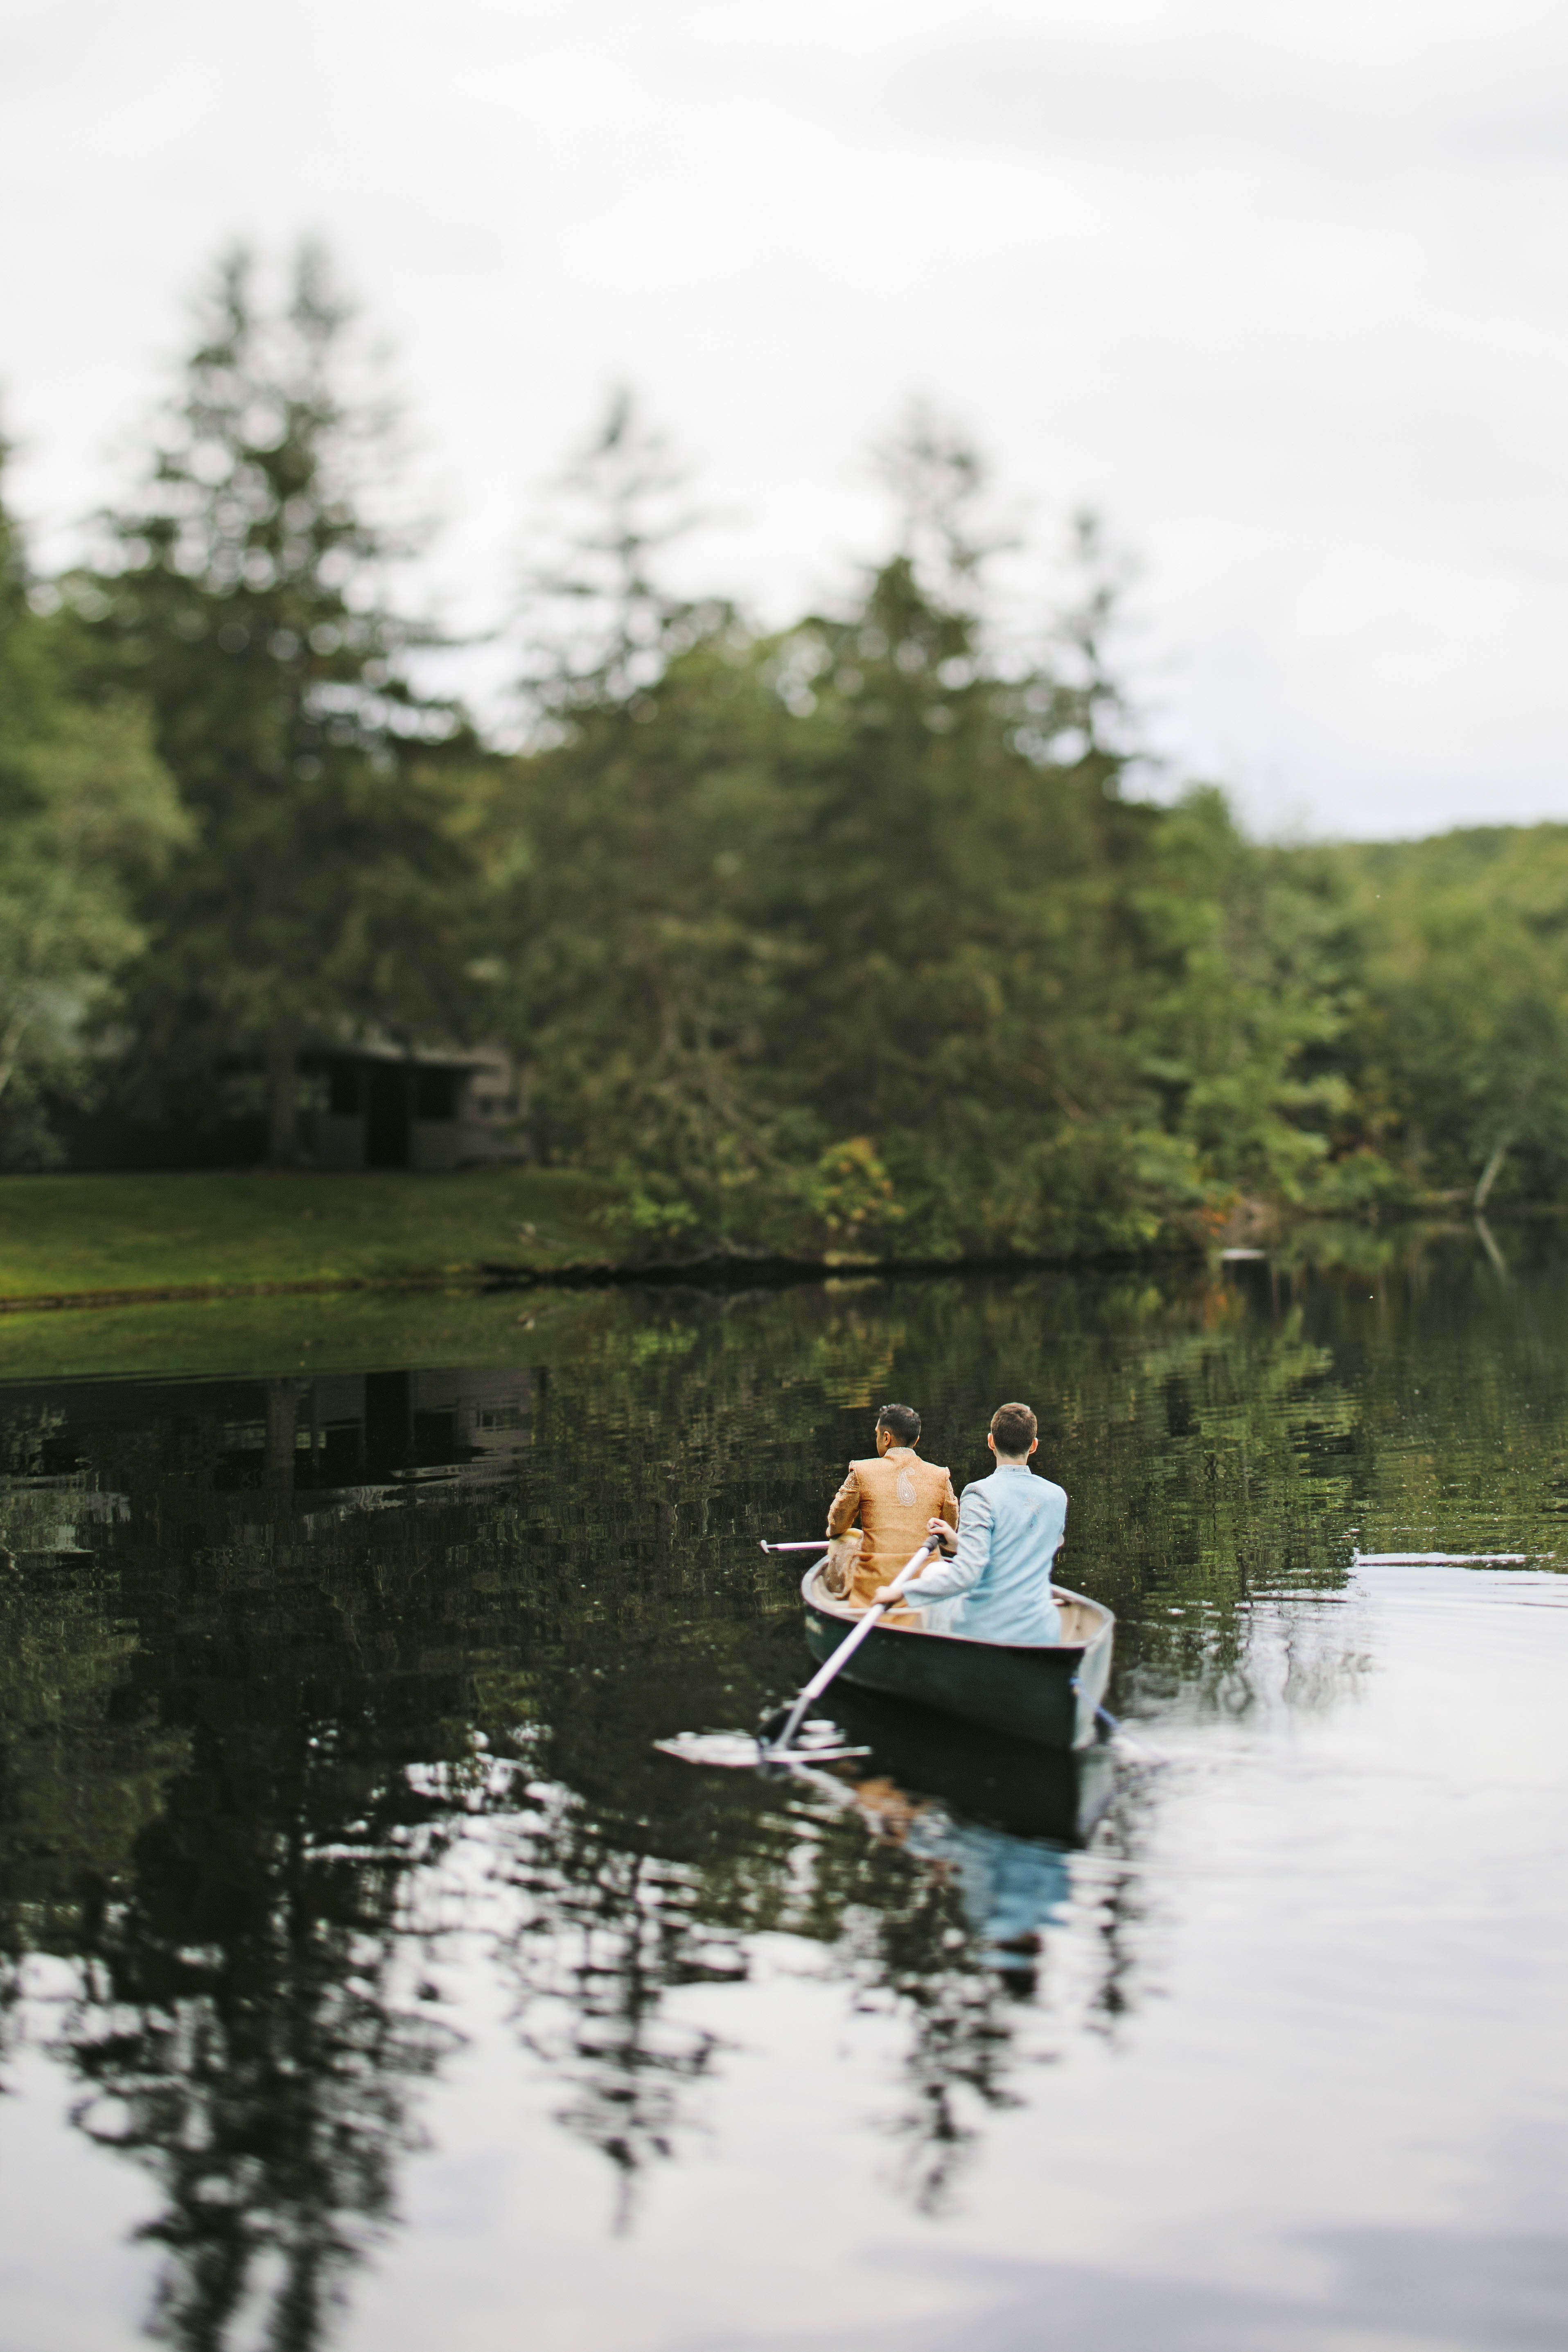 sanjay steven wedding grooms canoe